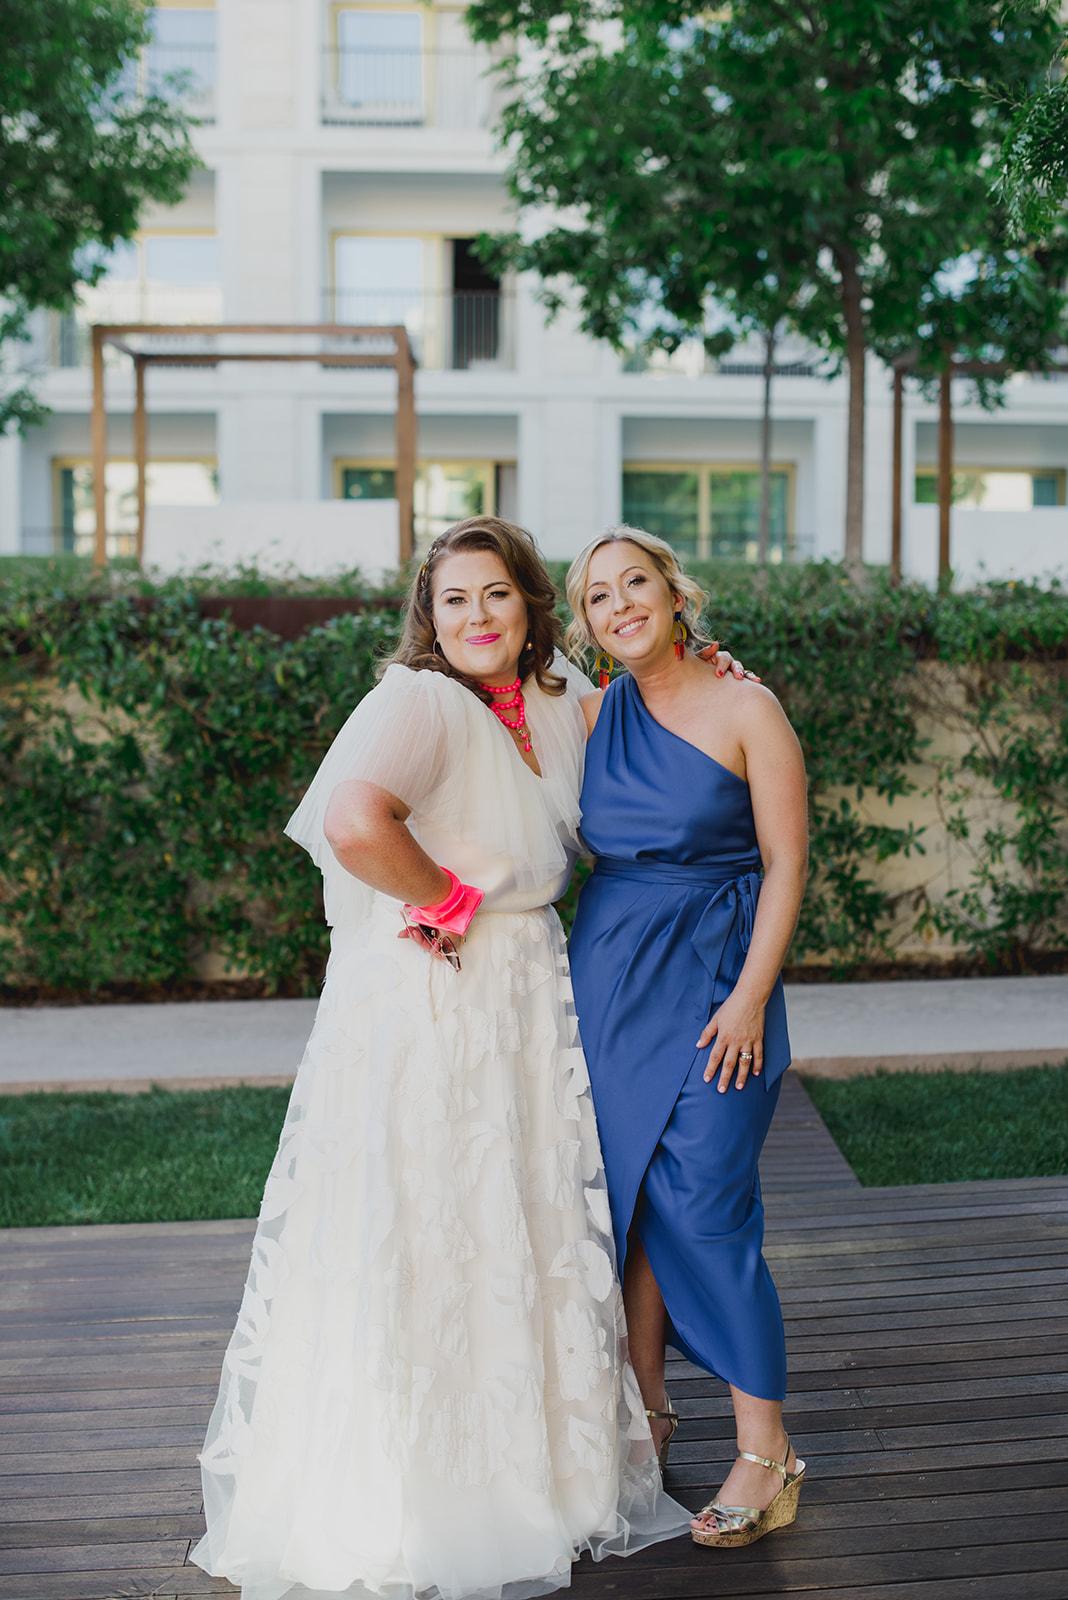 Beautiful bride Riki wore a wedding dress by Halfpenny London